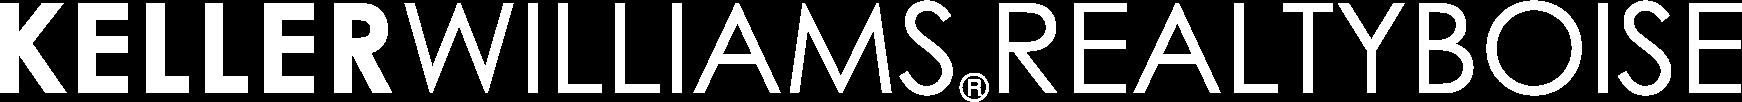 KW_Logo_Long_White.png